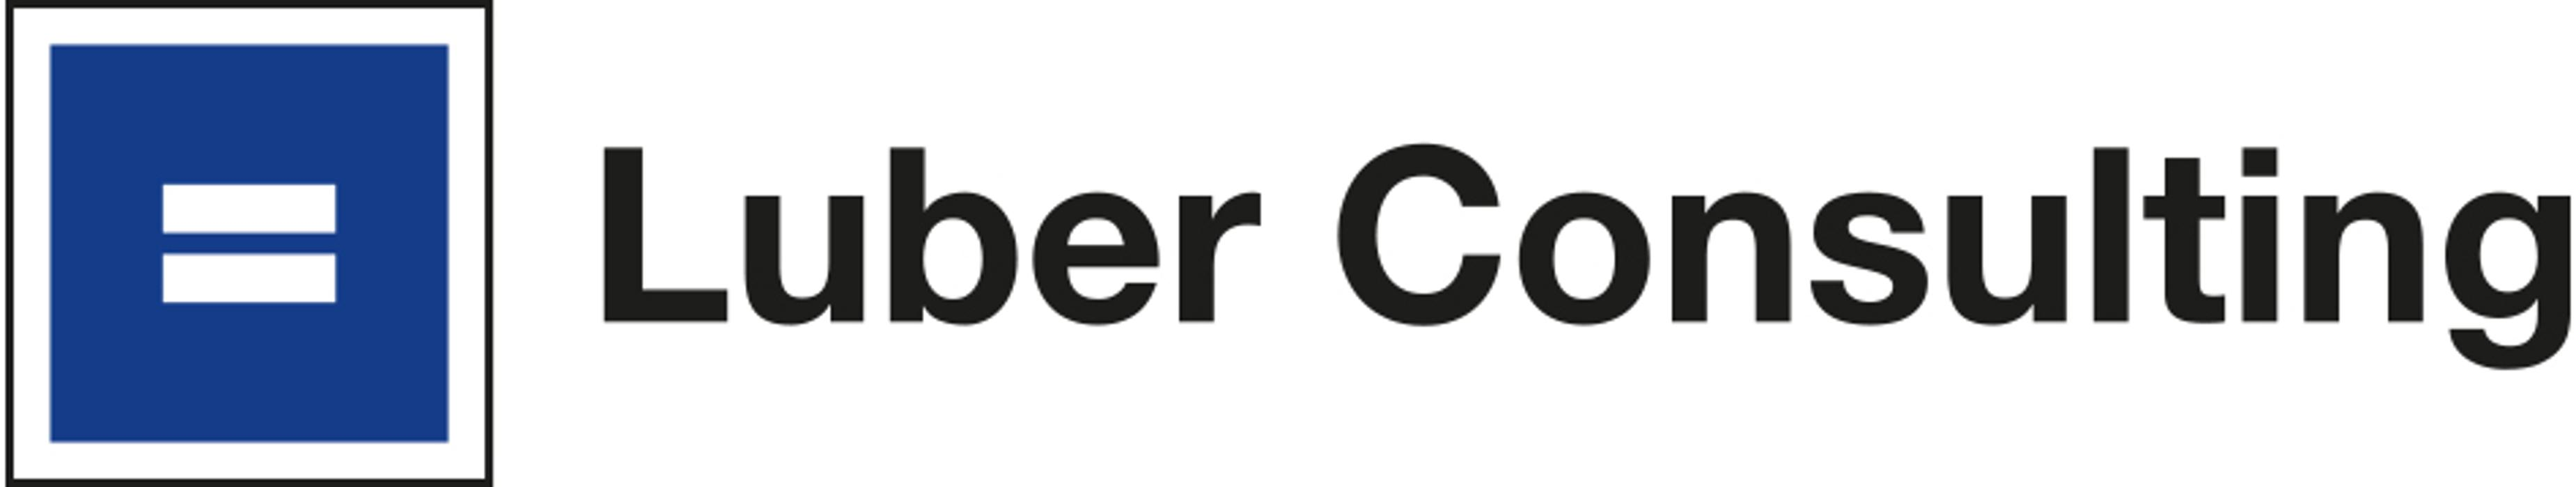 Bild zu Luber Consulting in Bonn